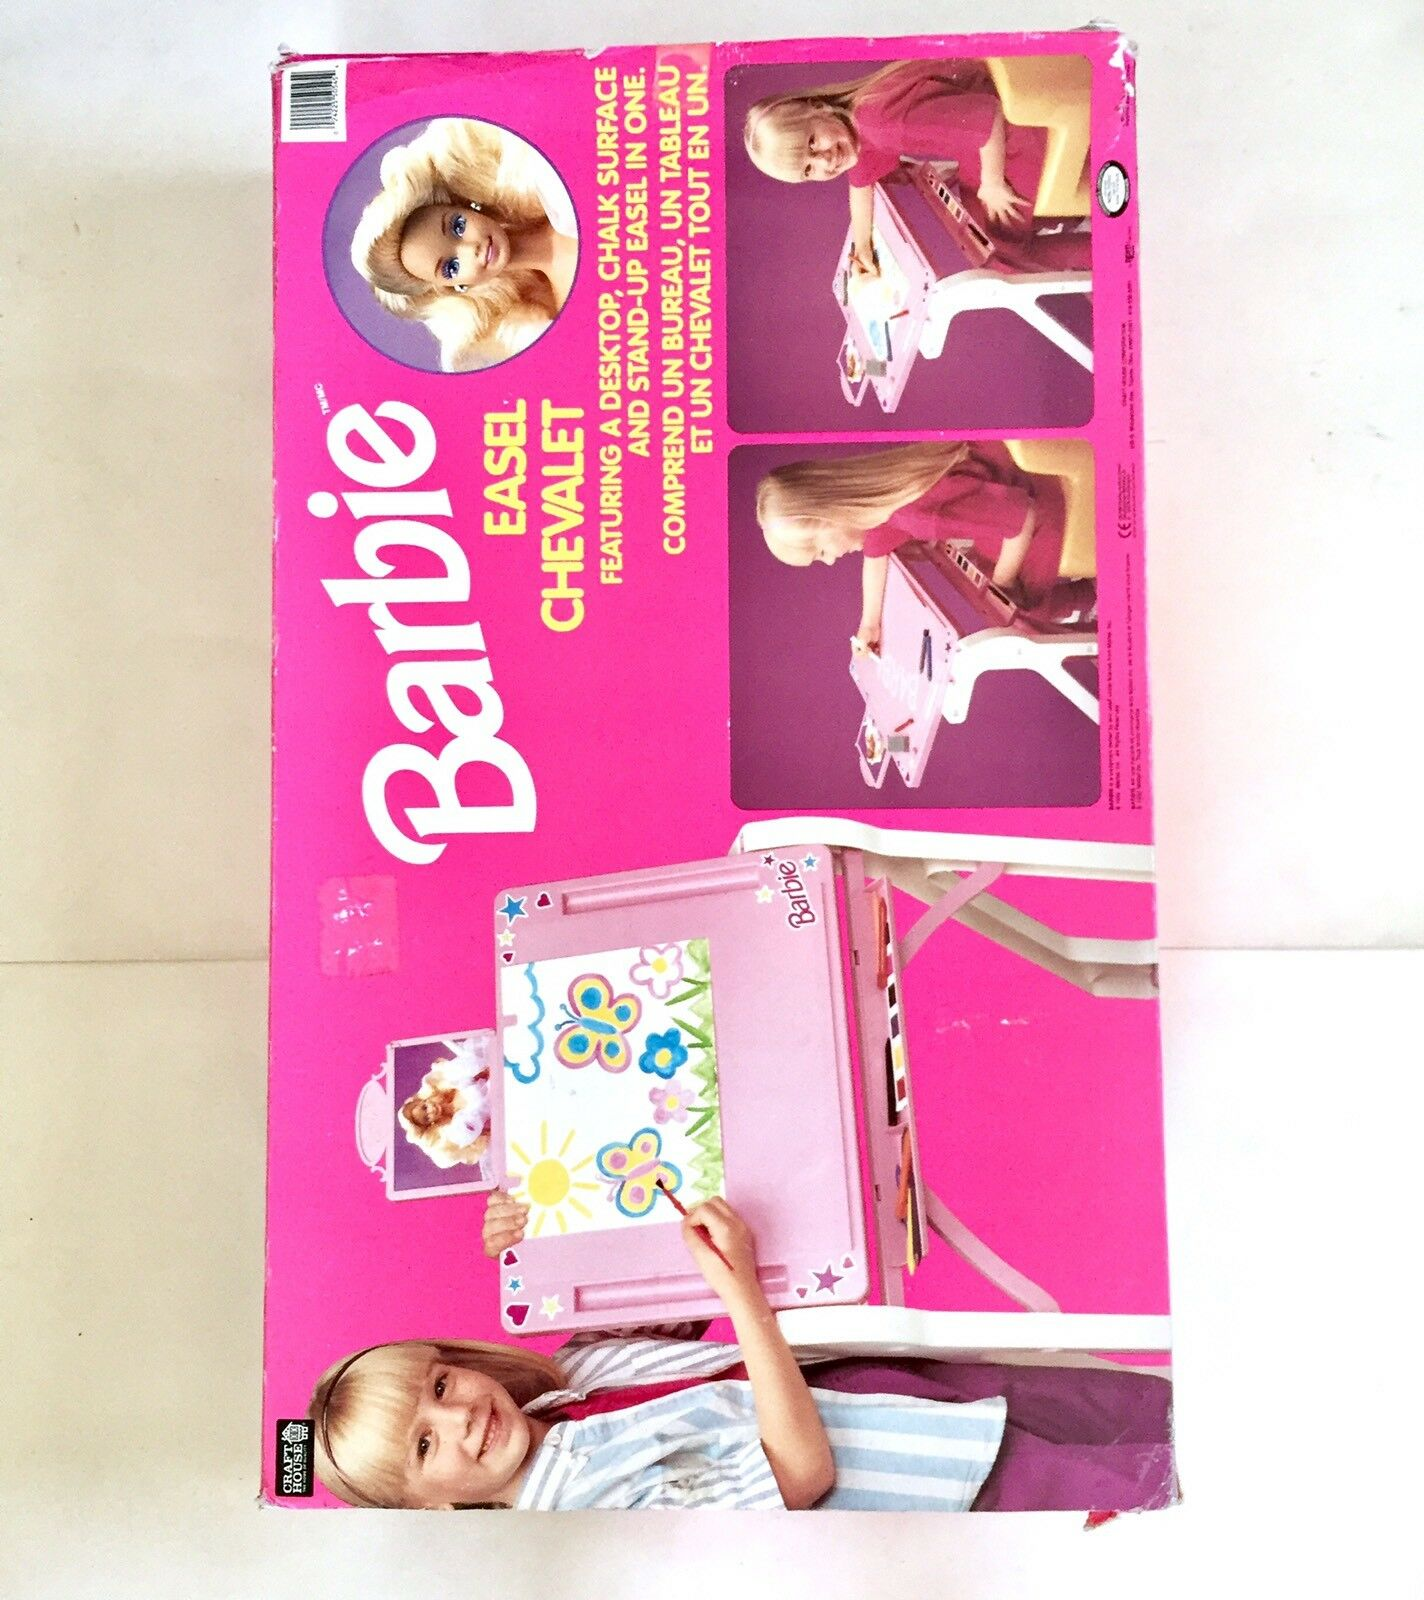 Barbie 1992 rosadododo Niñas Niños Tamaño Completo Artista Craft caballete Chevalet Craft House